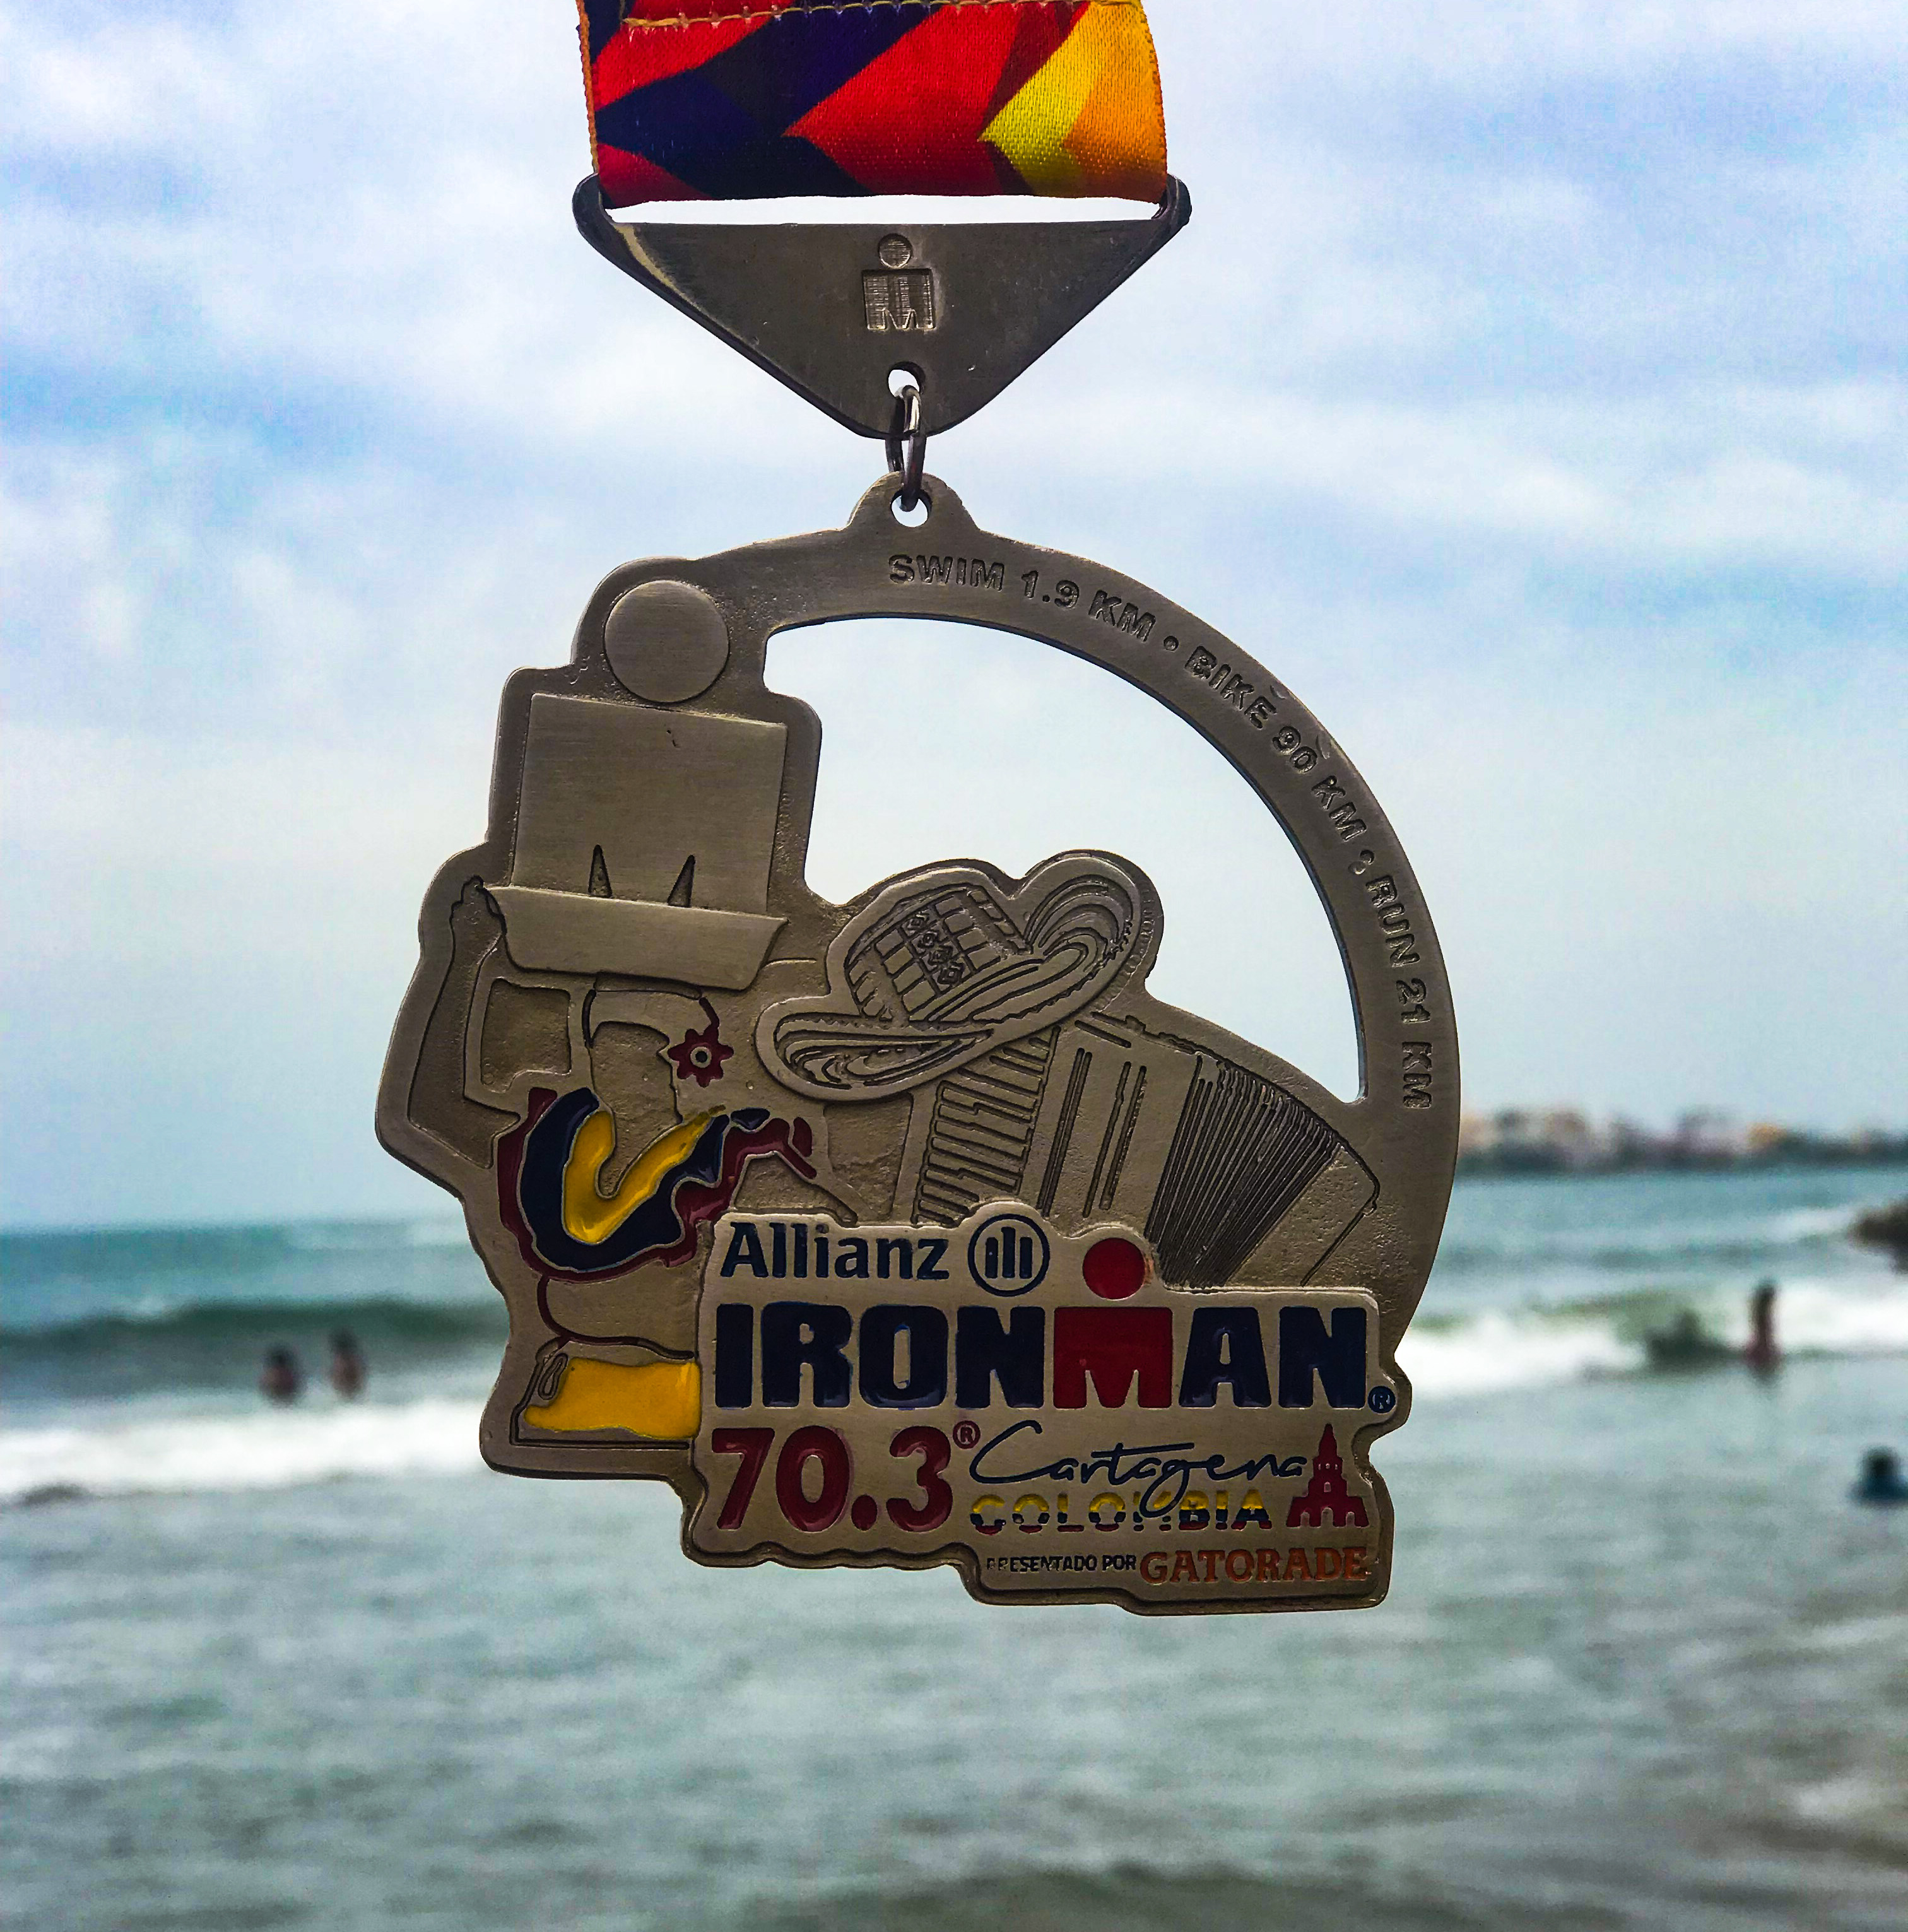 dba34fb28aba Mi Segundo Ironman 70.3 - Cartagena 2017 - El Blog de Nati